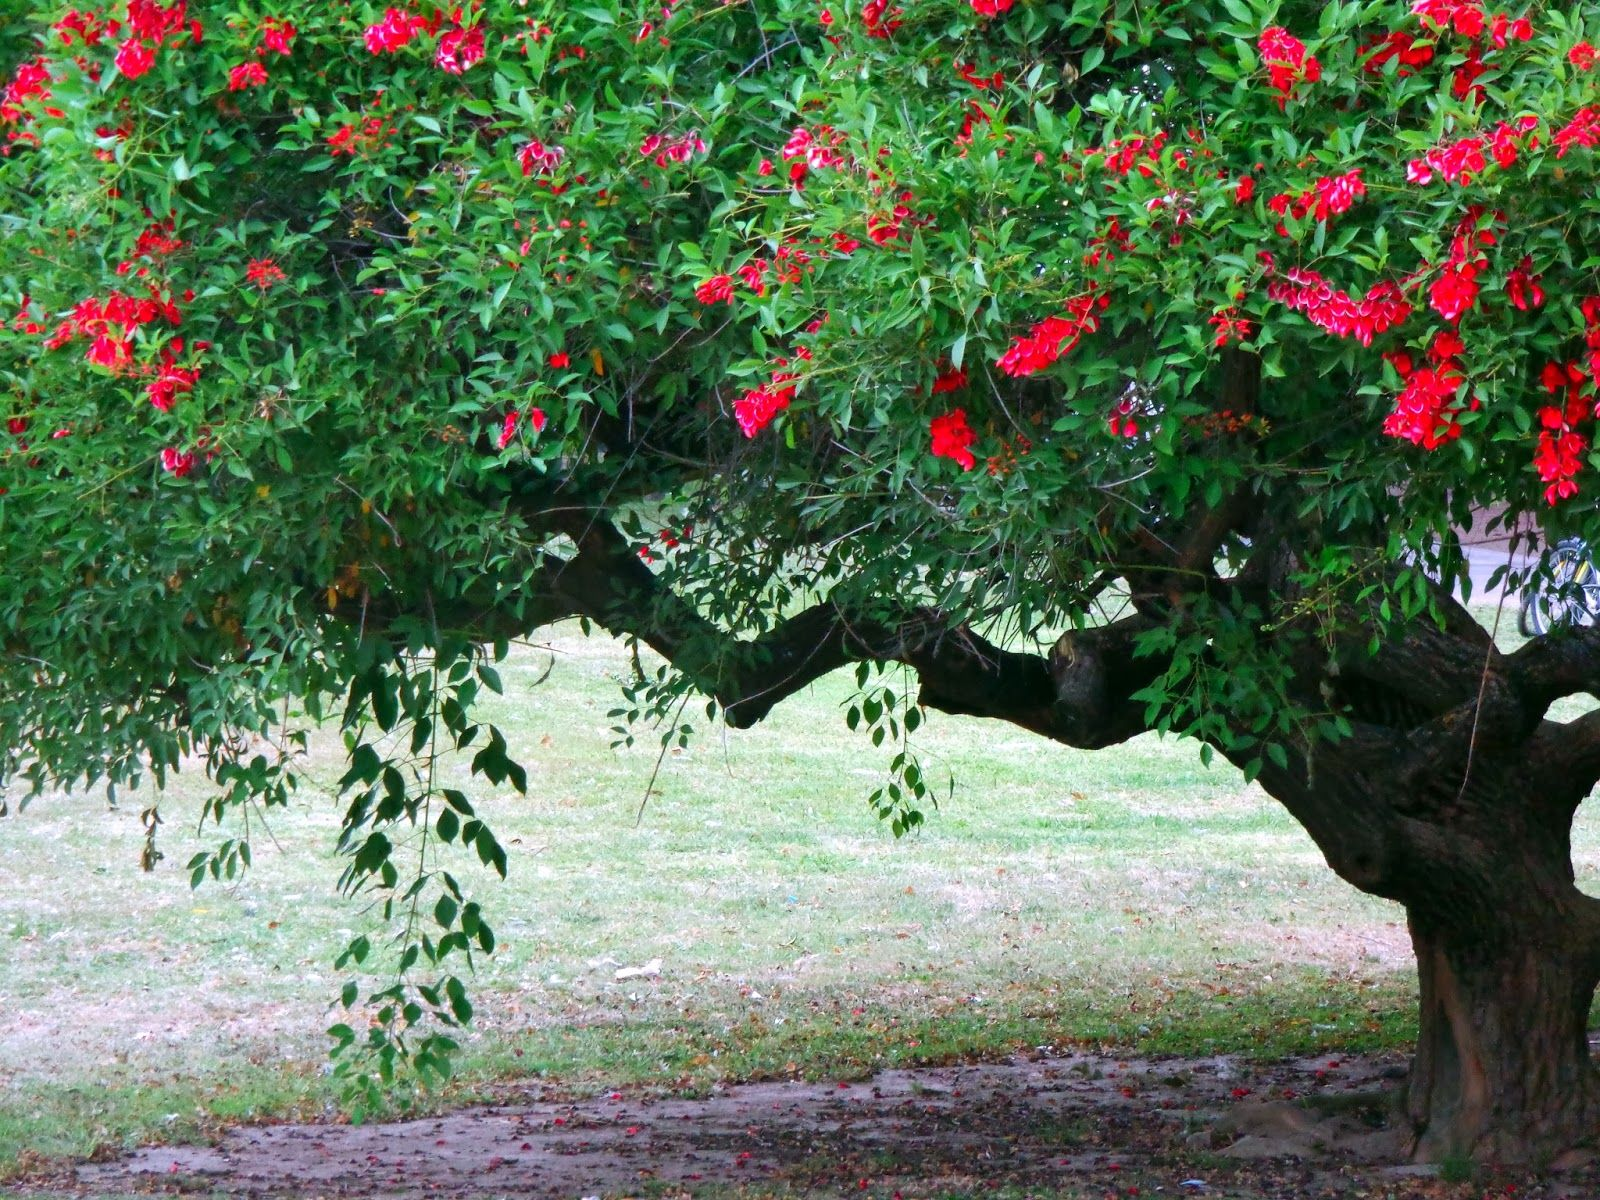 La Leyenda de la Flor del Ceibo